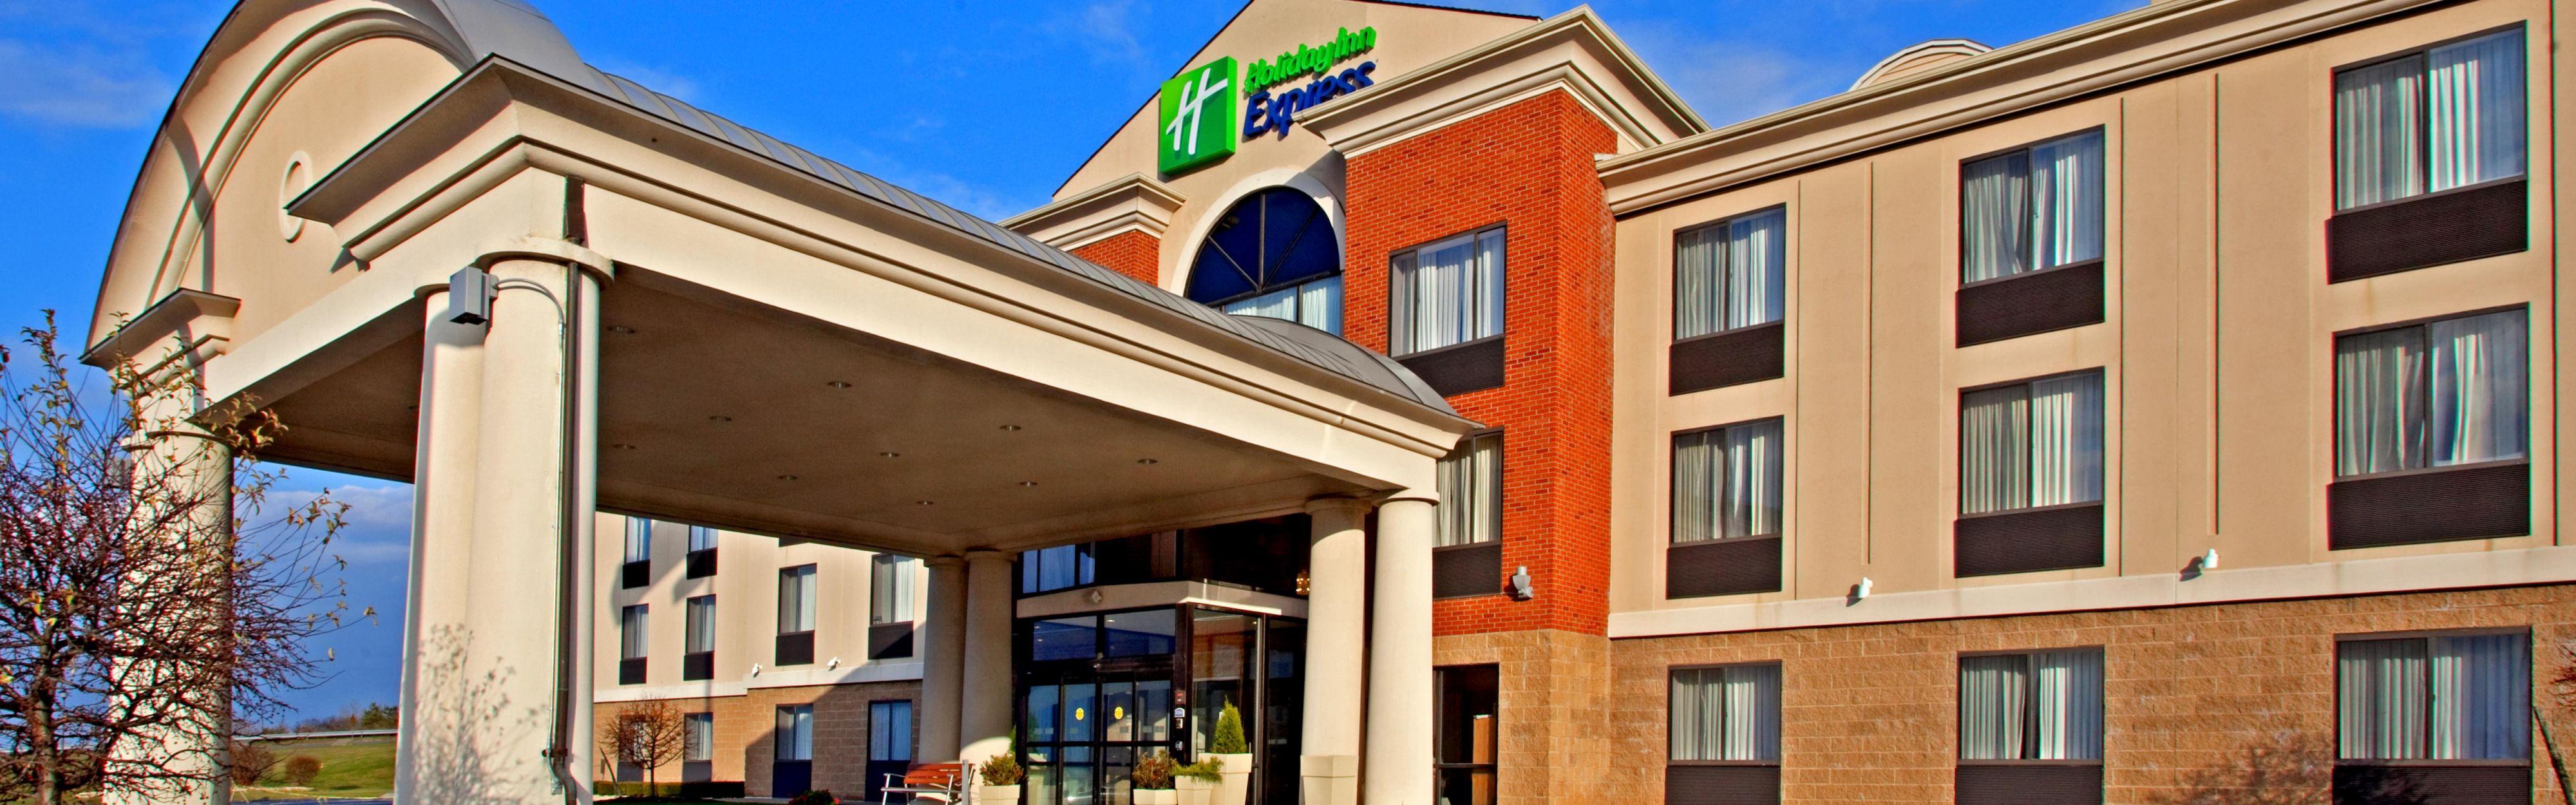 Best Hotels In Albany Ny